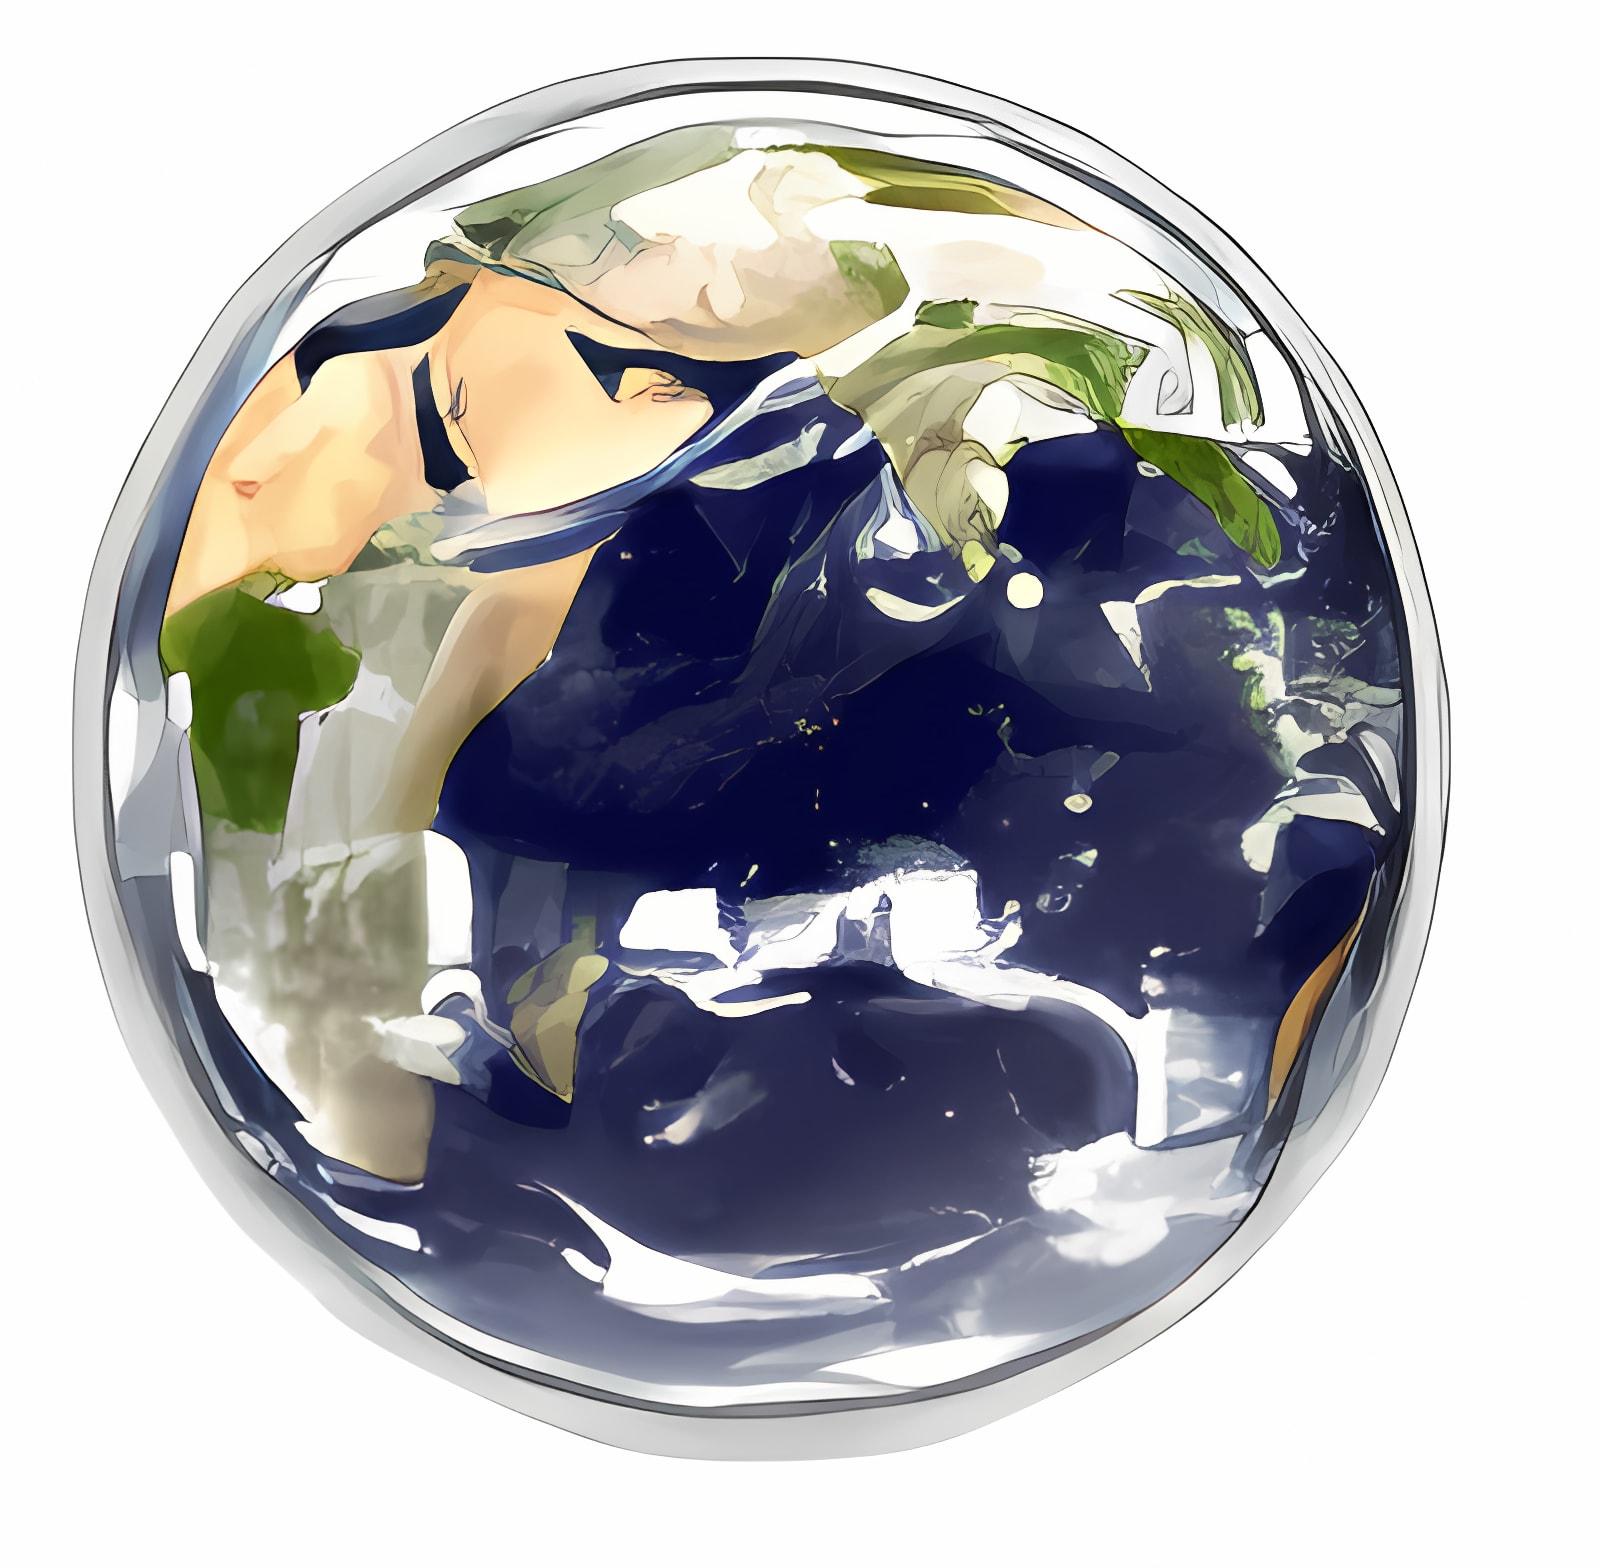 Earth3D 1.0.5